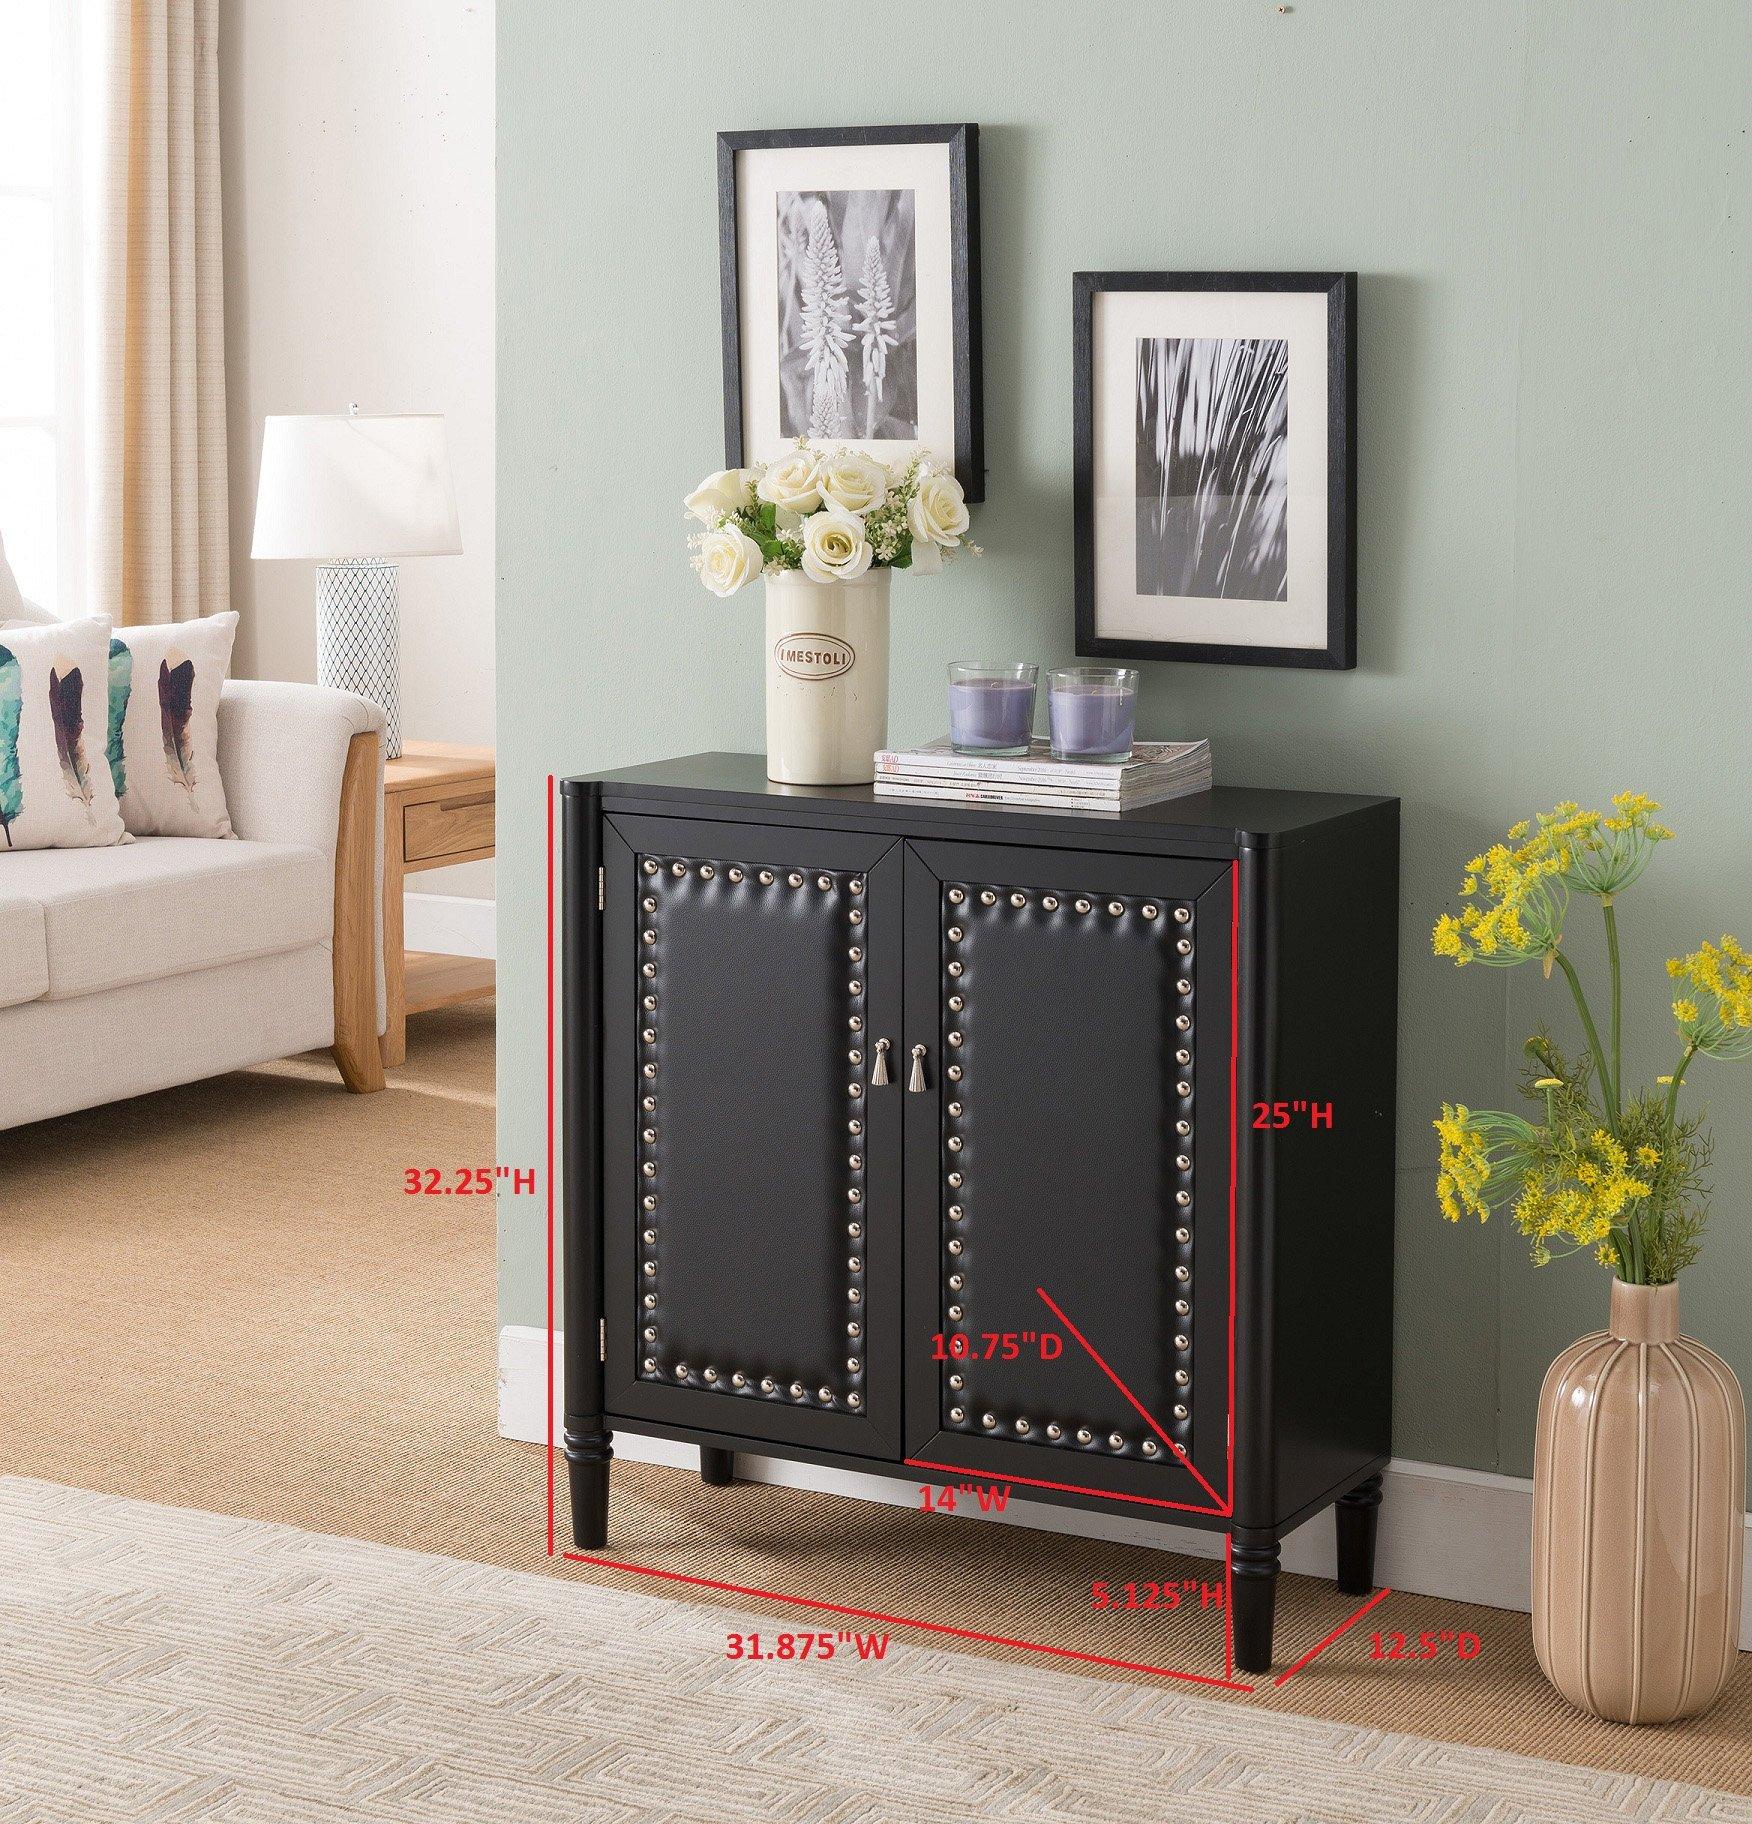 Kings Brand Furniture 2 Door Entryway Console Table Accent Cabinet, Black by Kings Brand Furniture (Image #2)